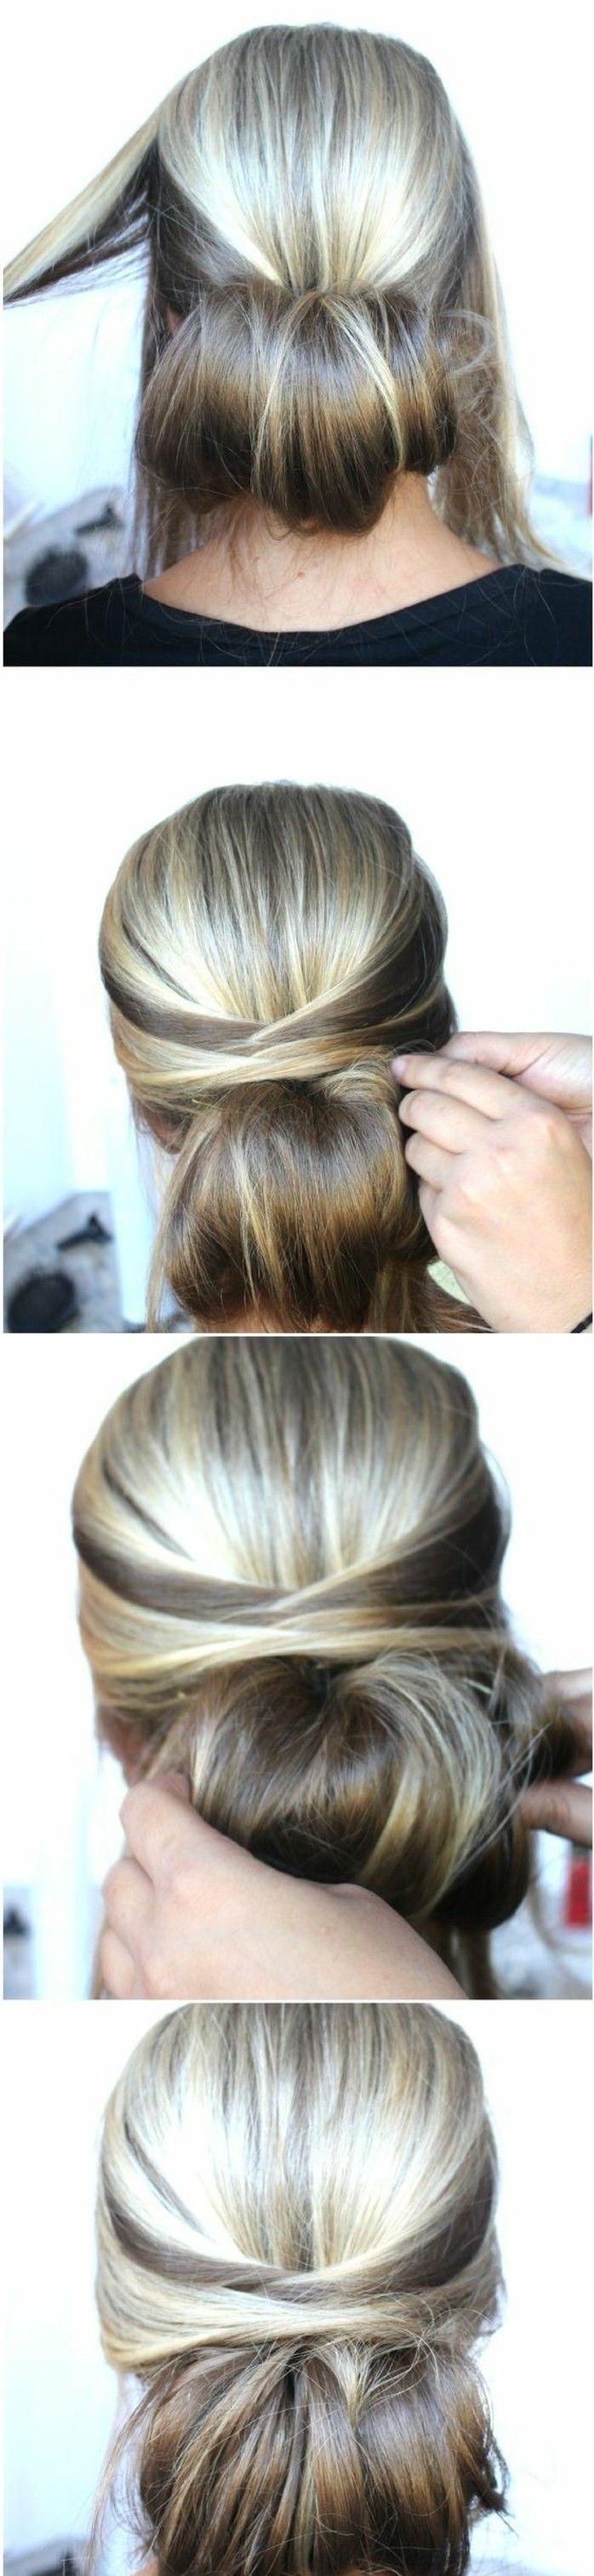 49 best Celebrity Hair images on Pinterest